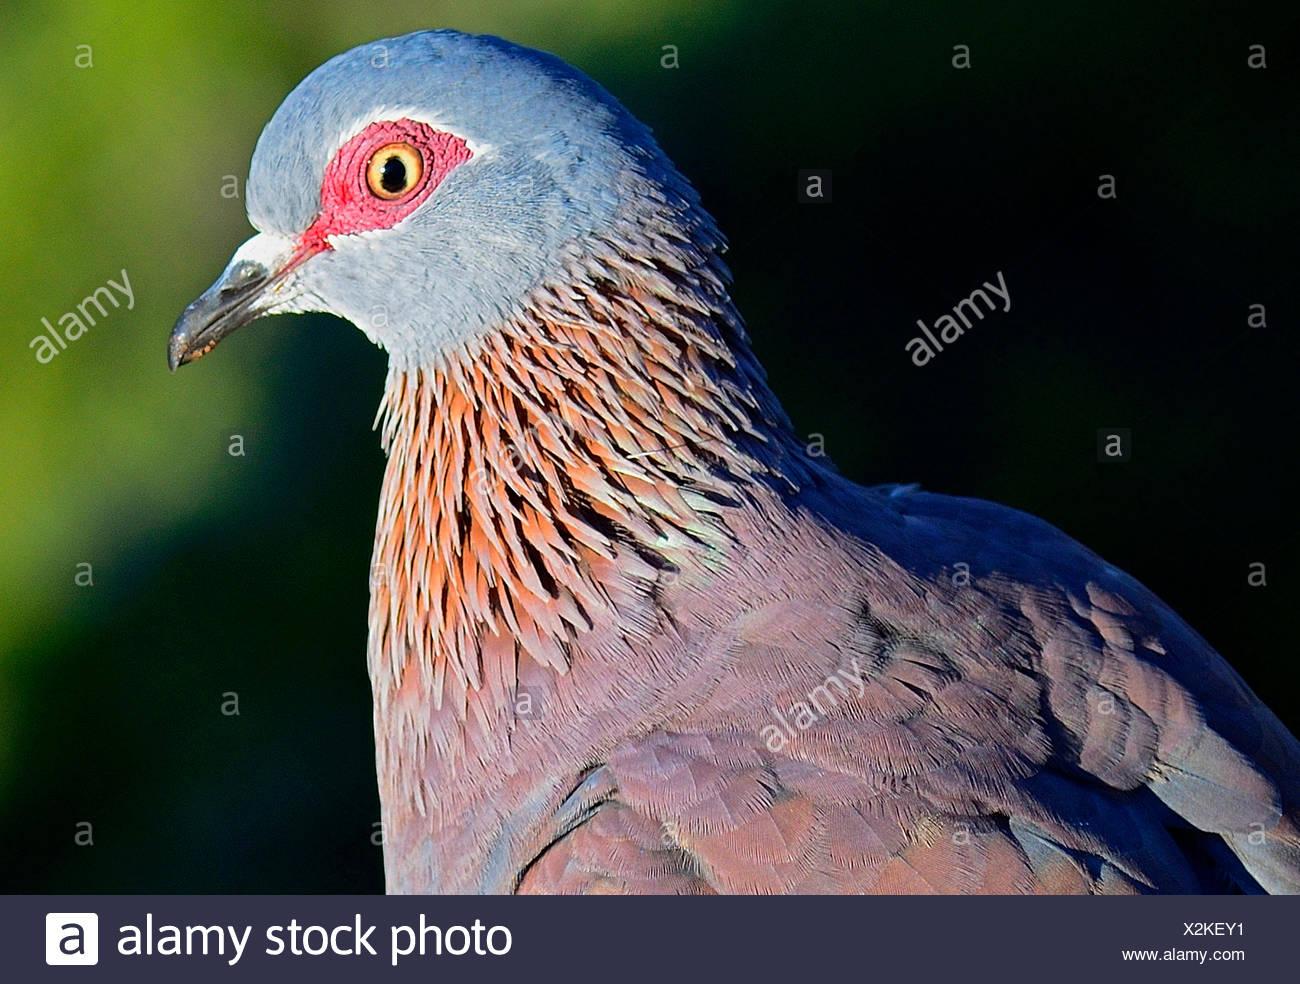 speckled pigeon (Columba guinea), portrait, South Africa, Tafelberg - Stock Image